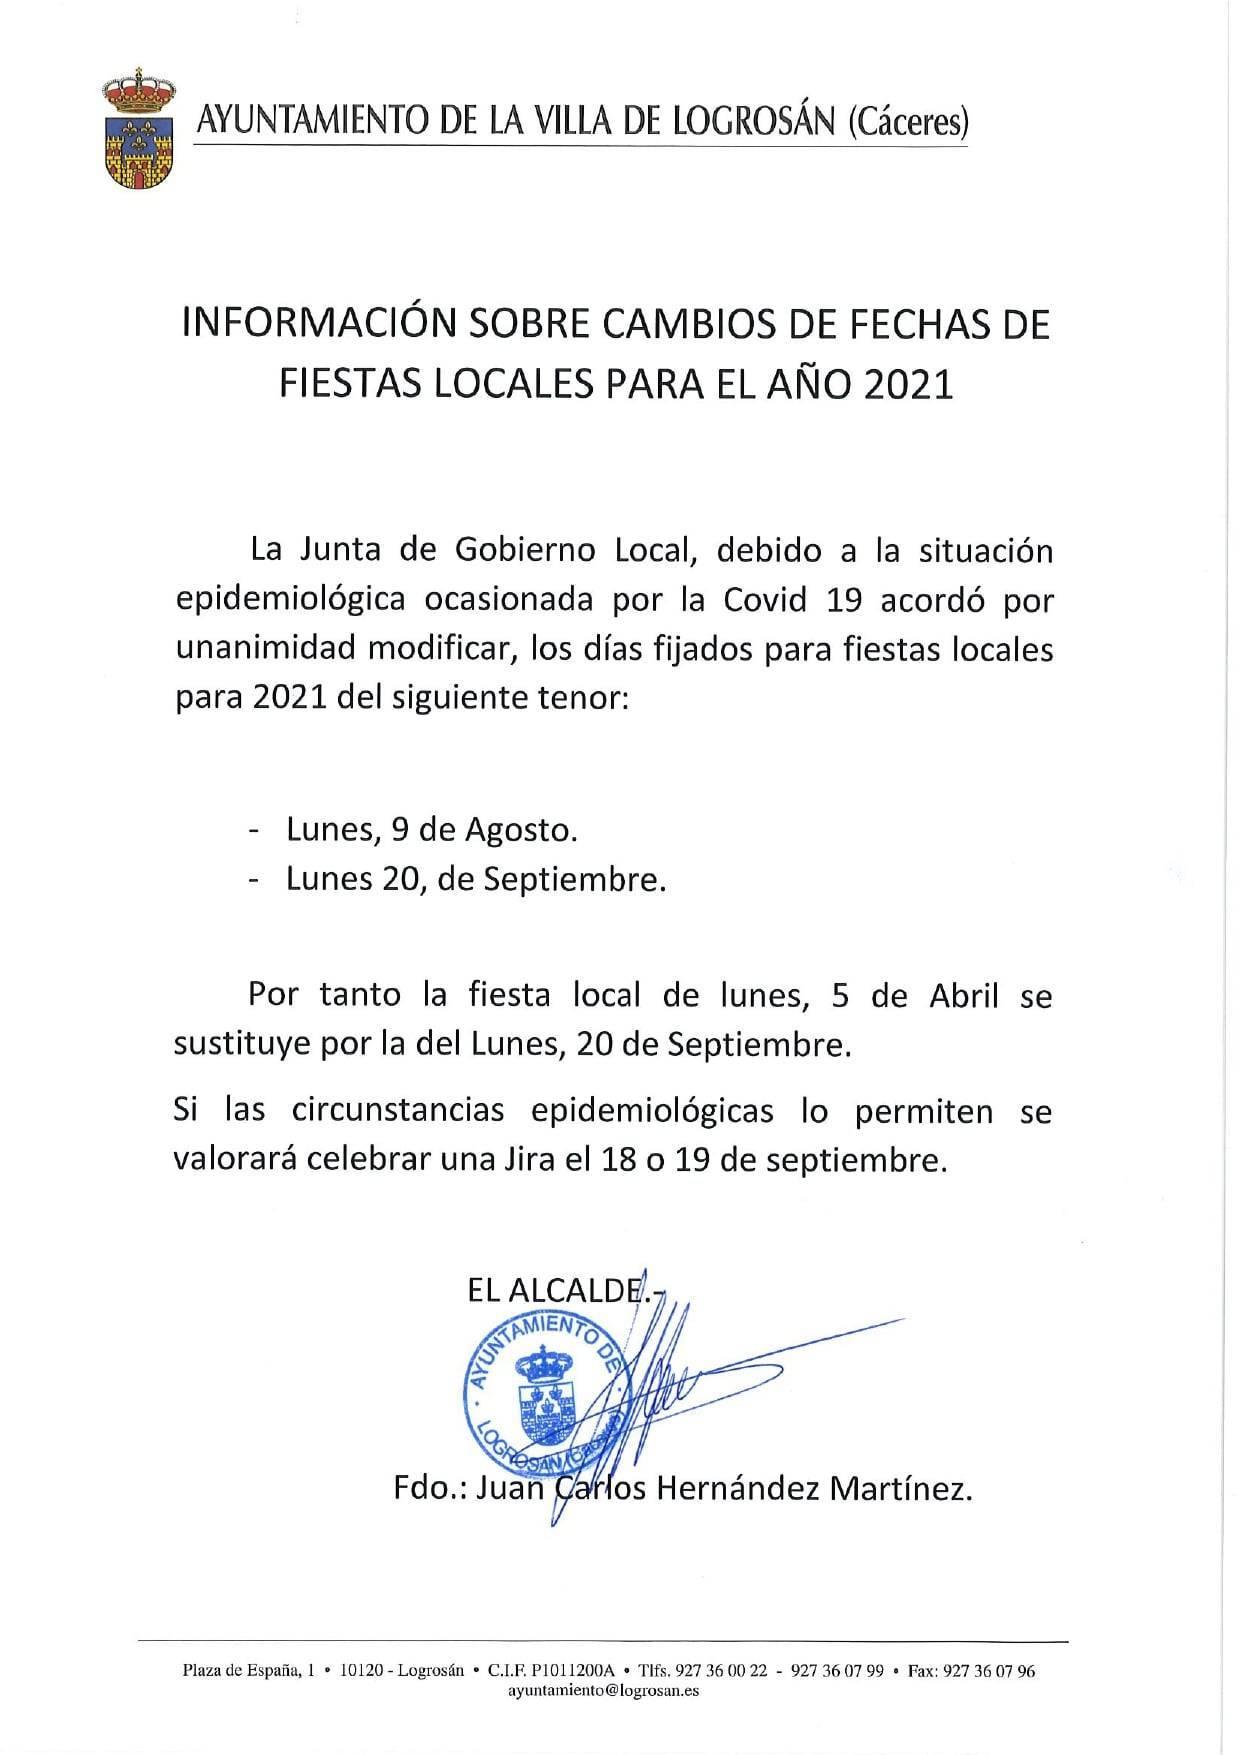 Cambios de fechas de fiestas locales (2021) - Logrosán (Cáceres)